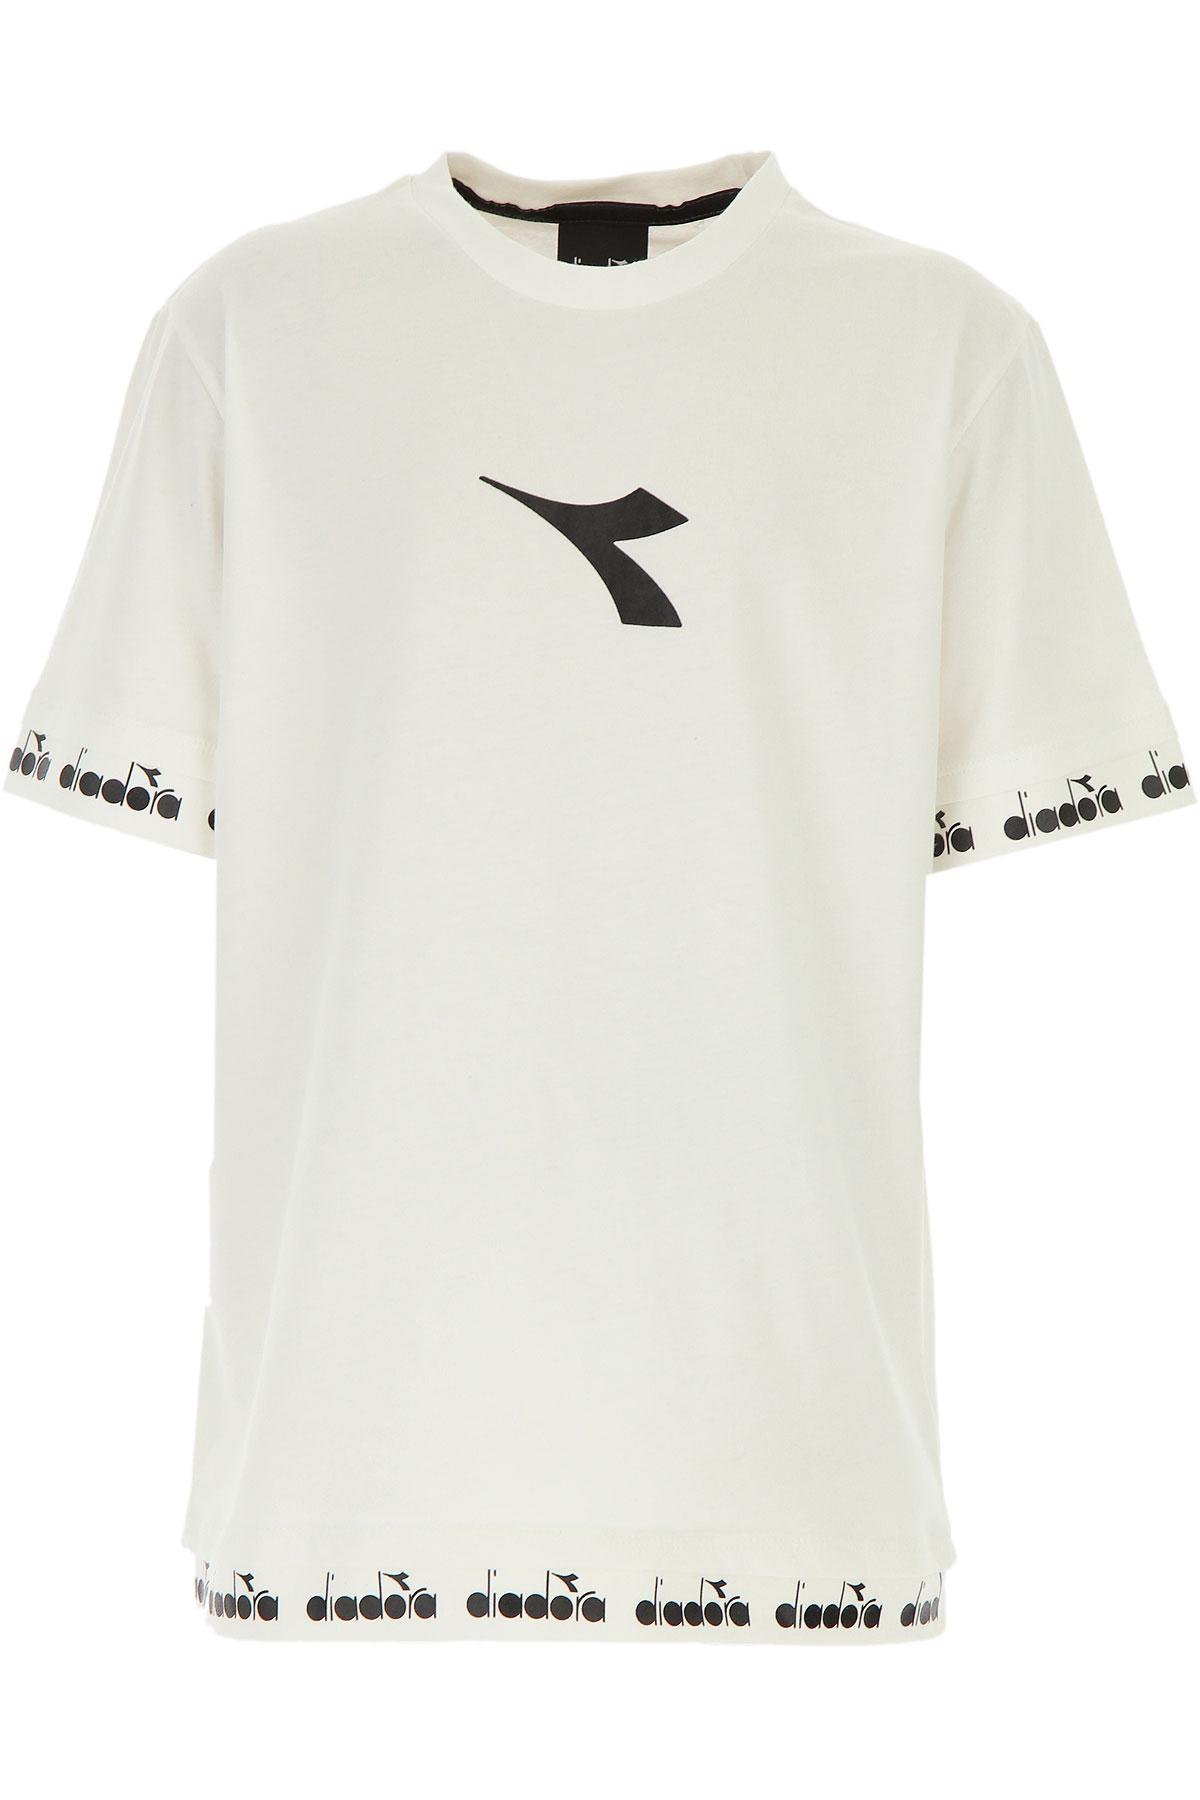 Diadora Kids T-Shirt for Boys On Sale, White, Cotton, 2019, 10Y 12Y 14Y